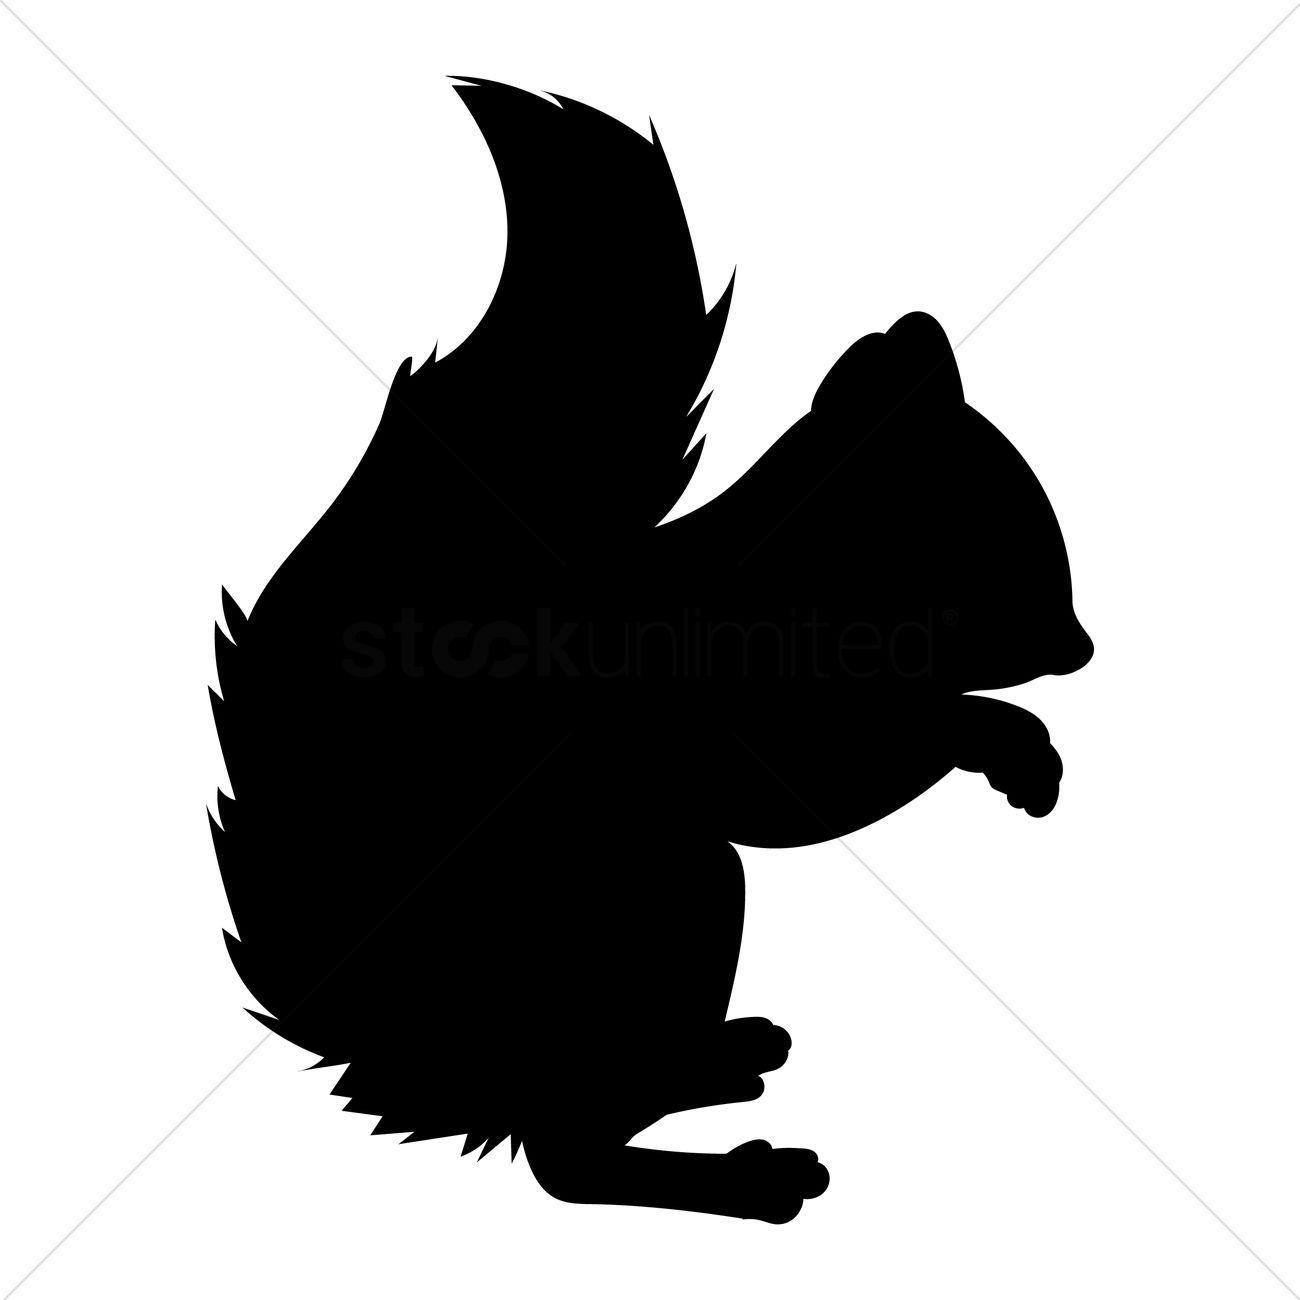 1300x1300 Squirrel Silhouette Vector Image